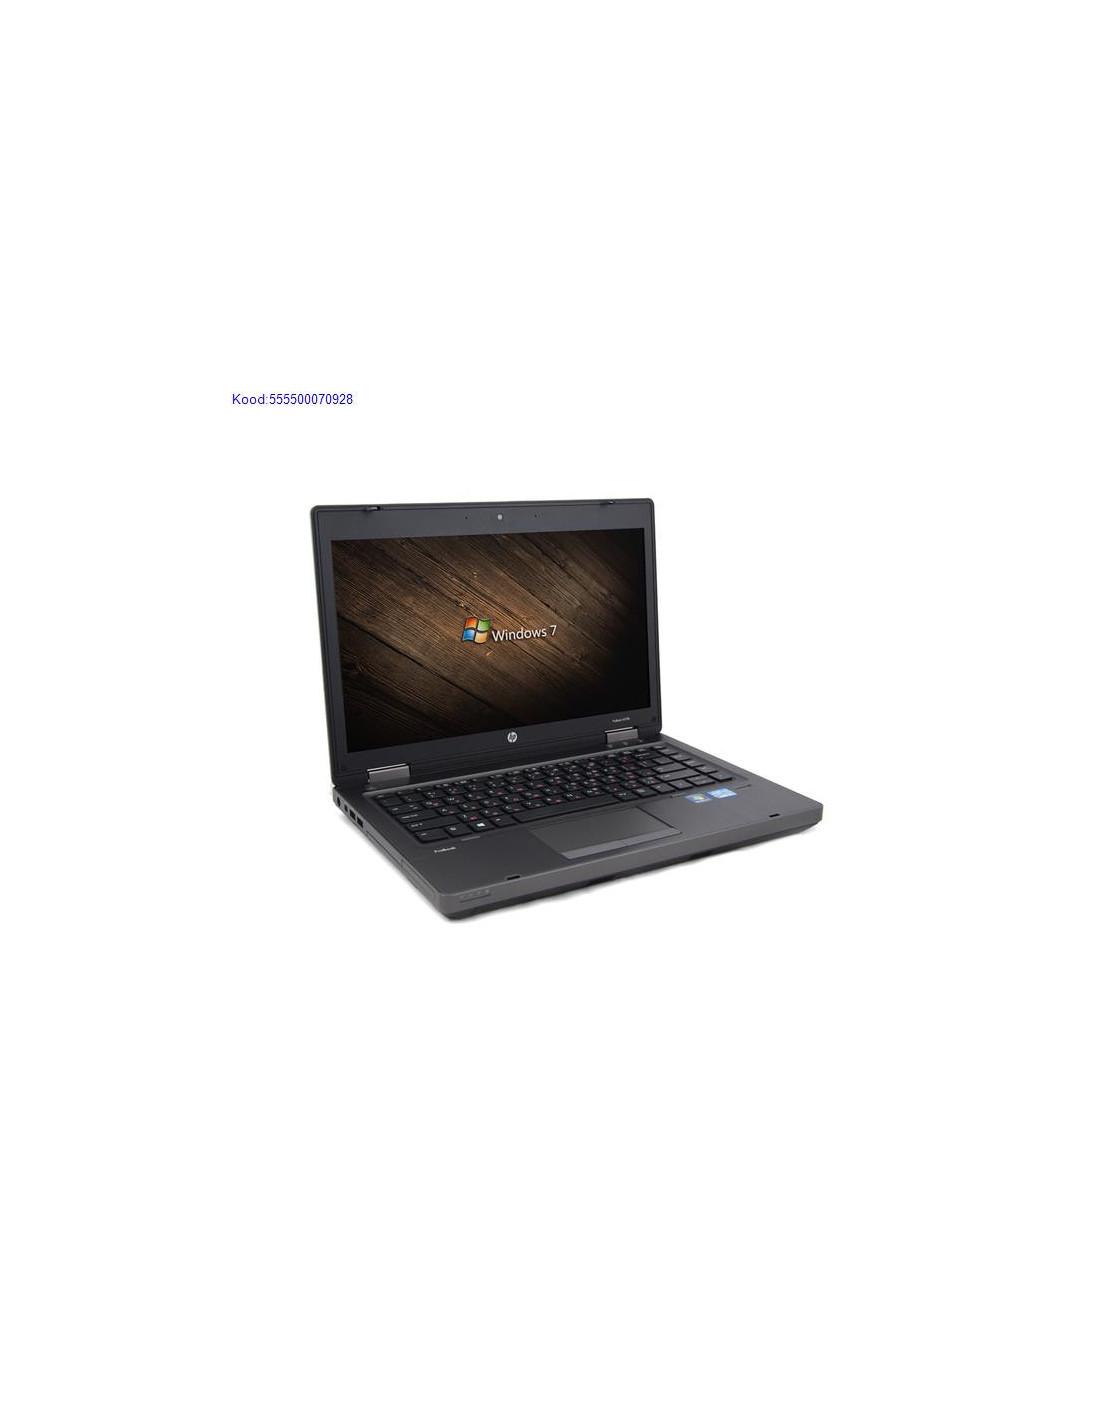 HP ProBook 6470b WiFi driver Solution